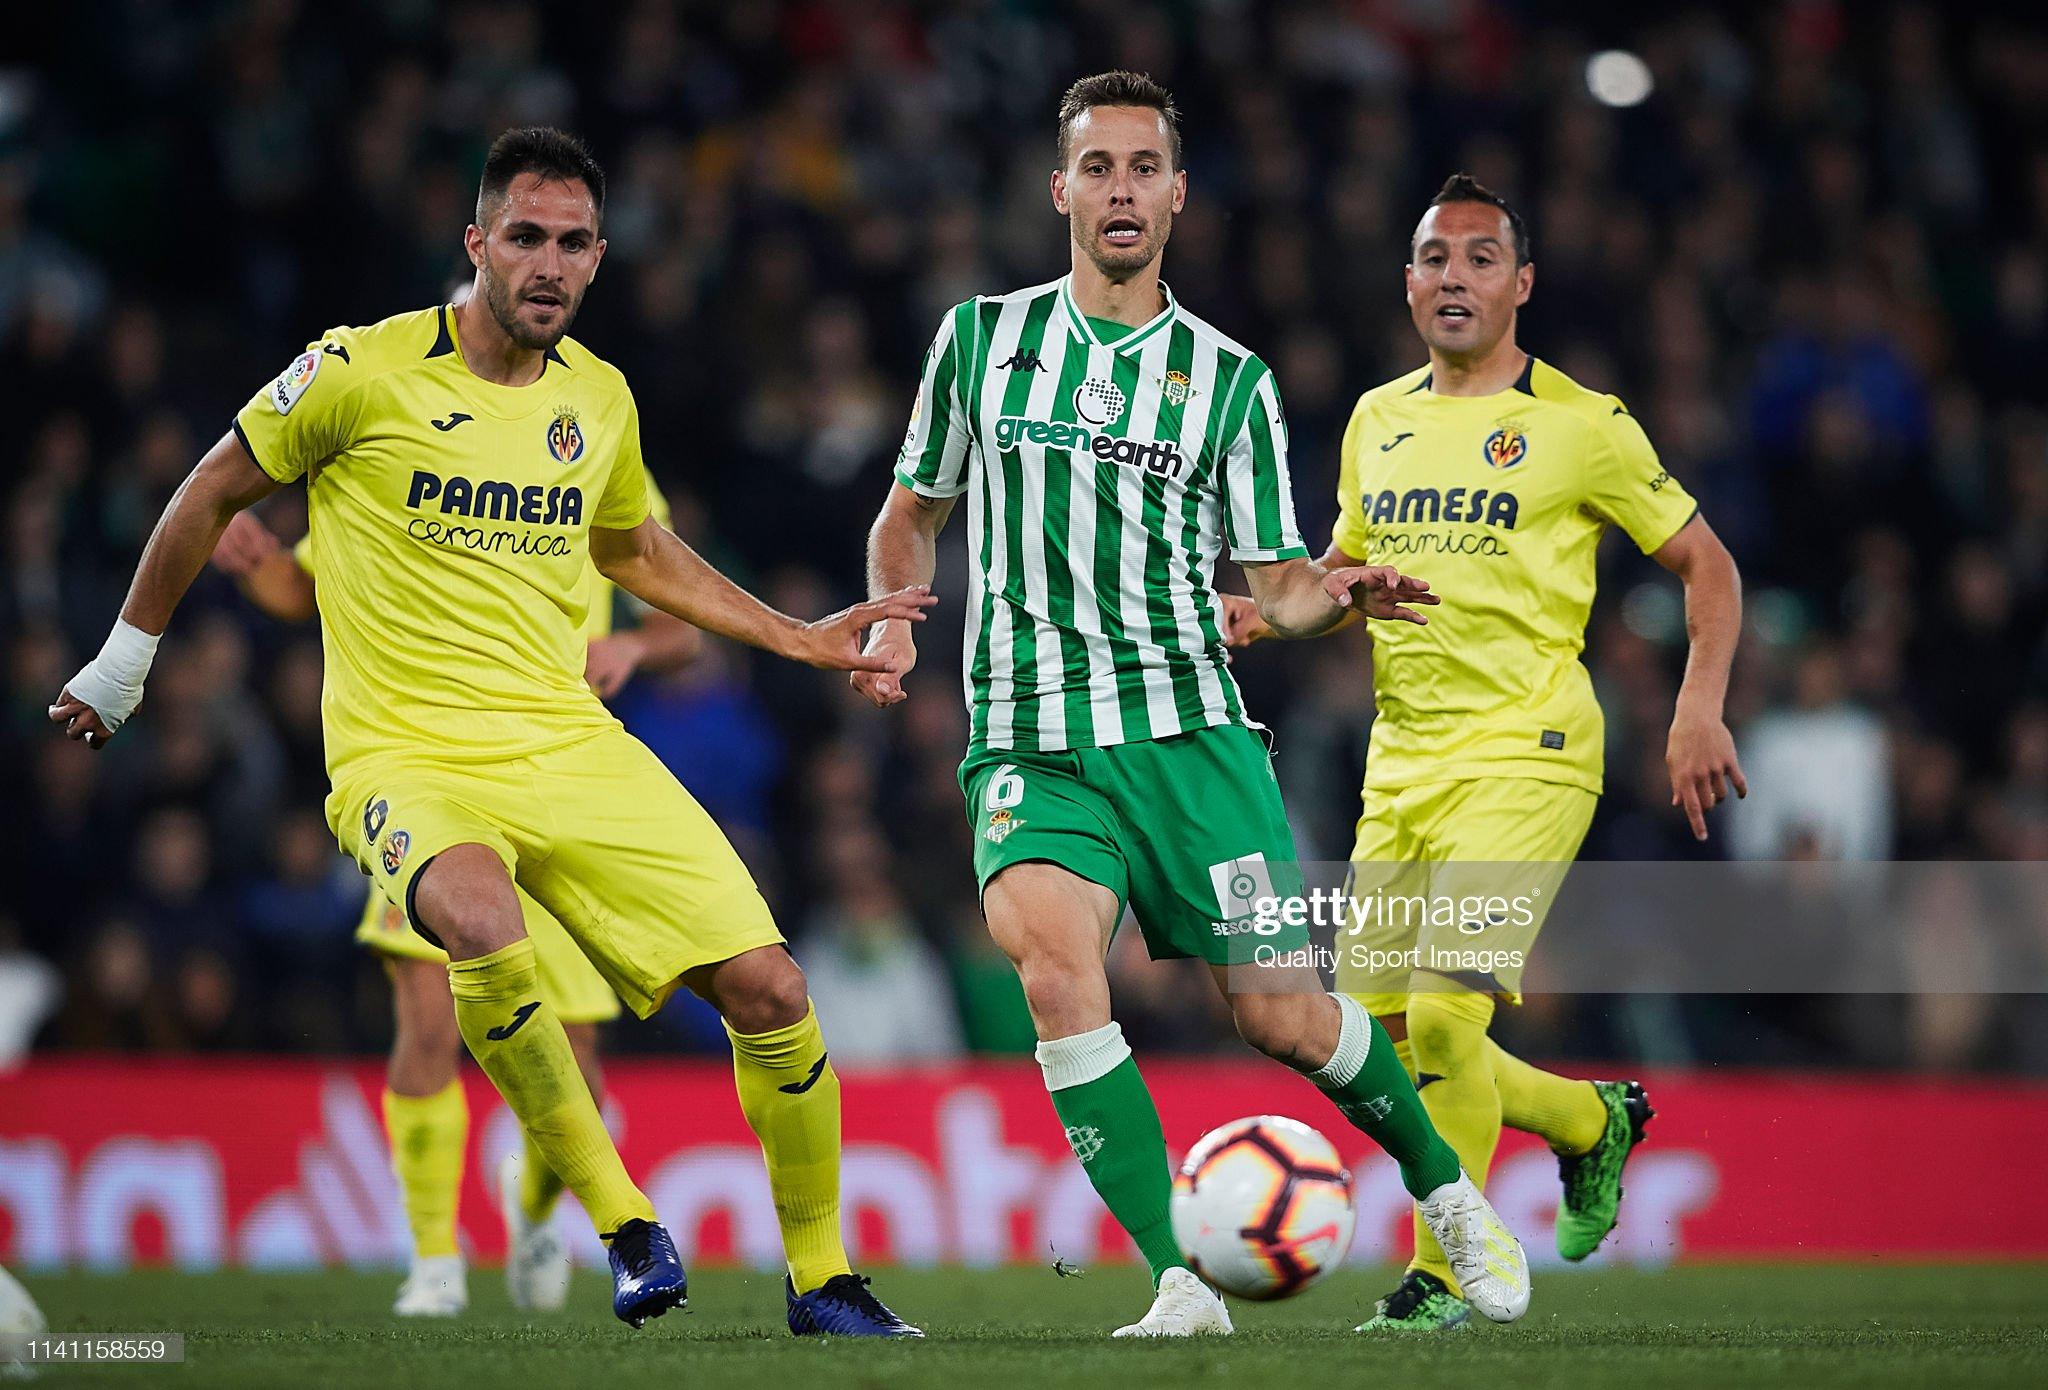 Villarreal v Real Betis preview, prediction and odds